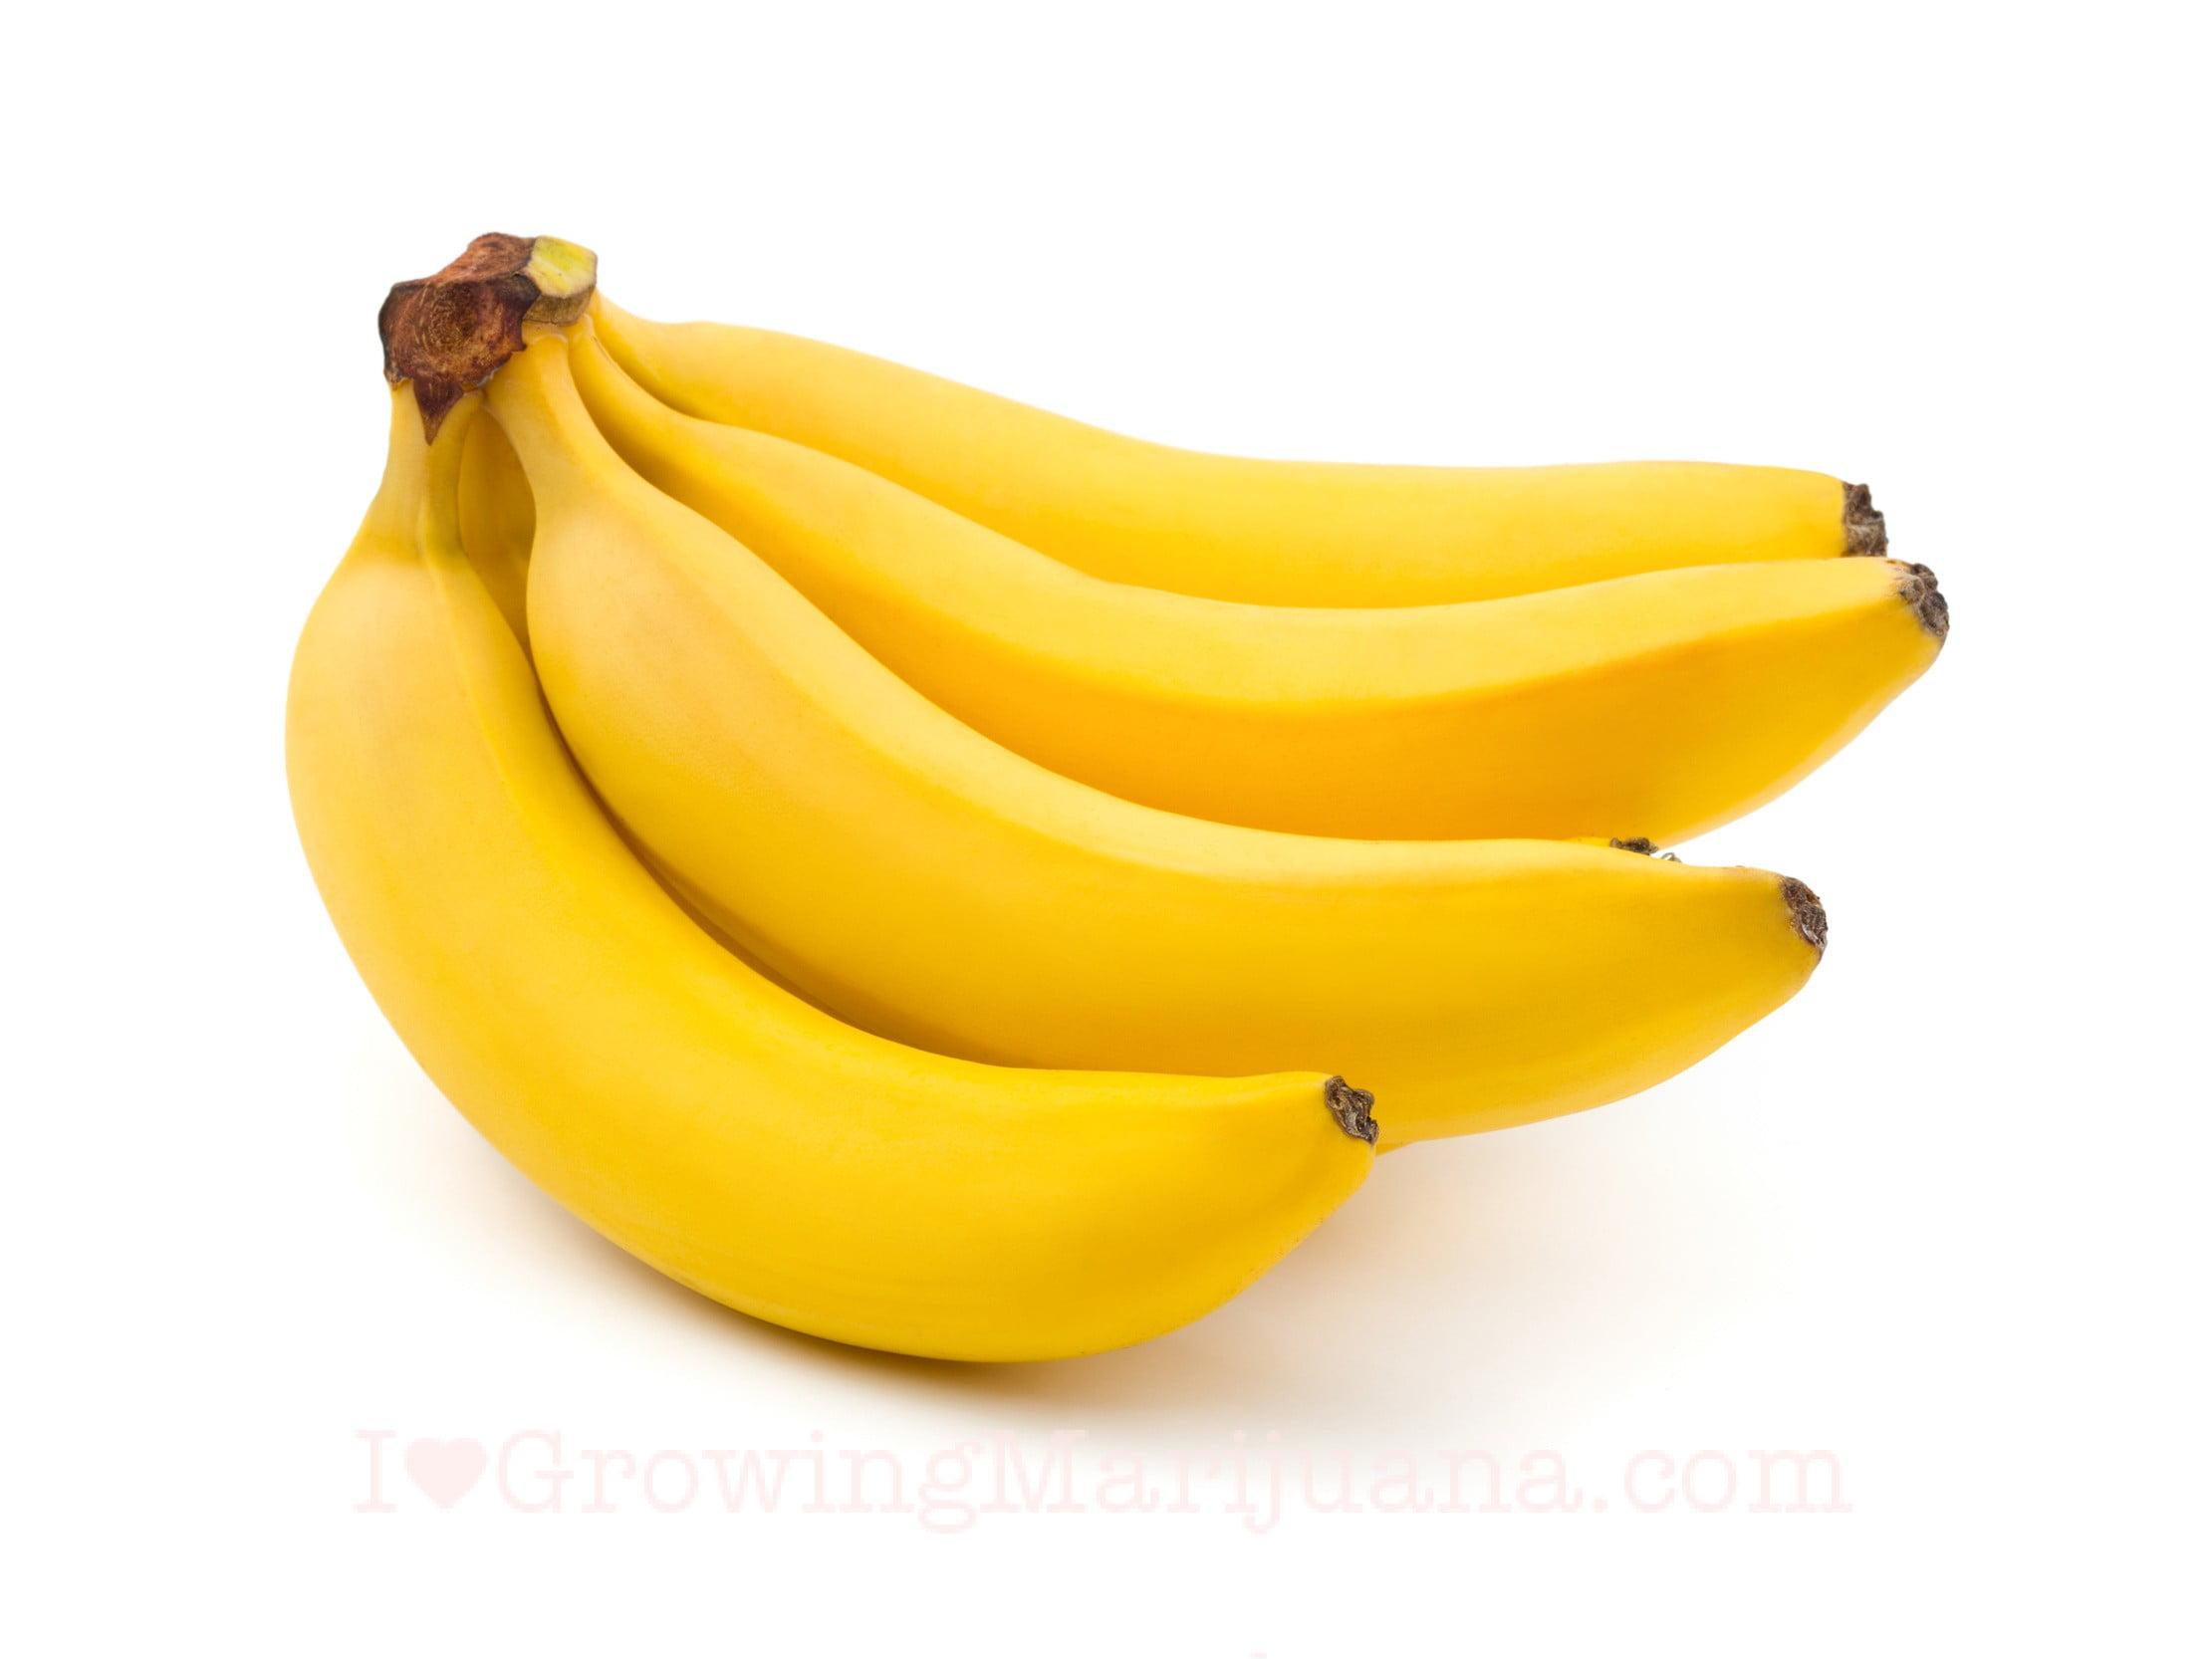 Cannabis bananas